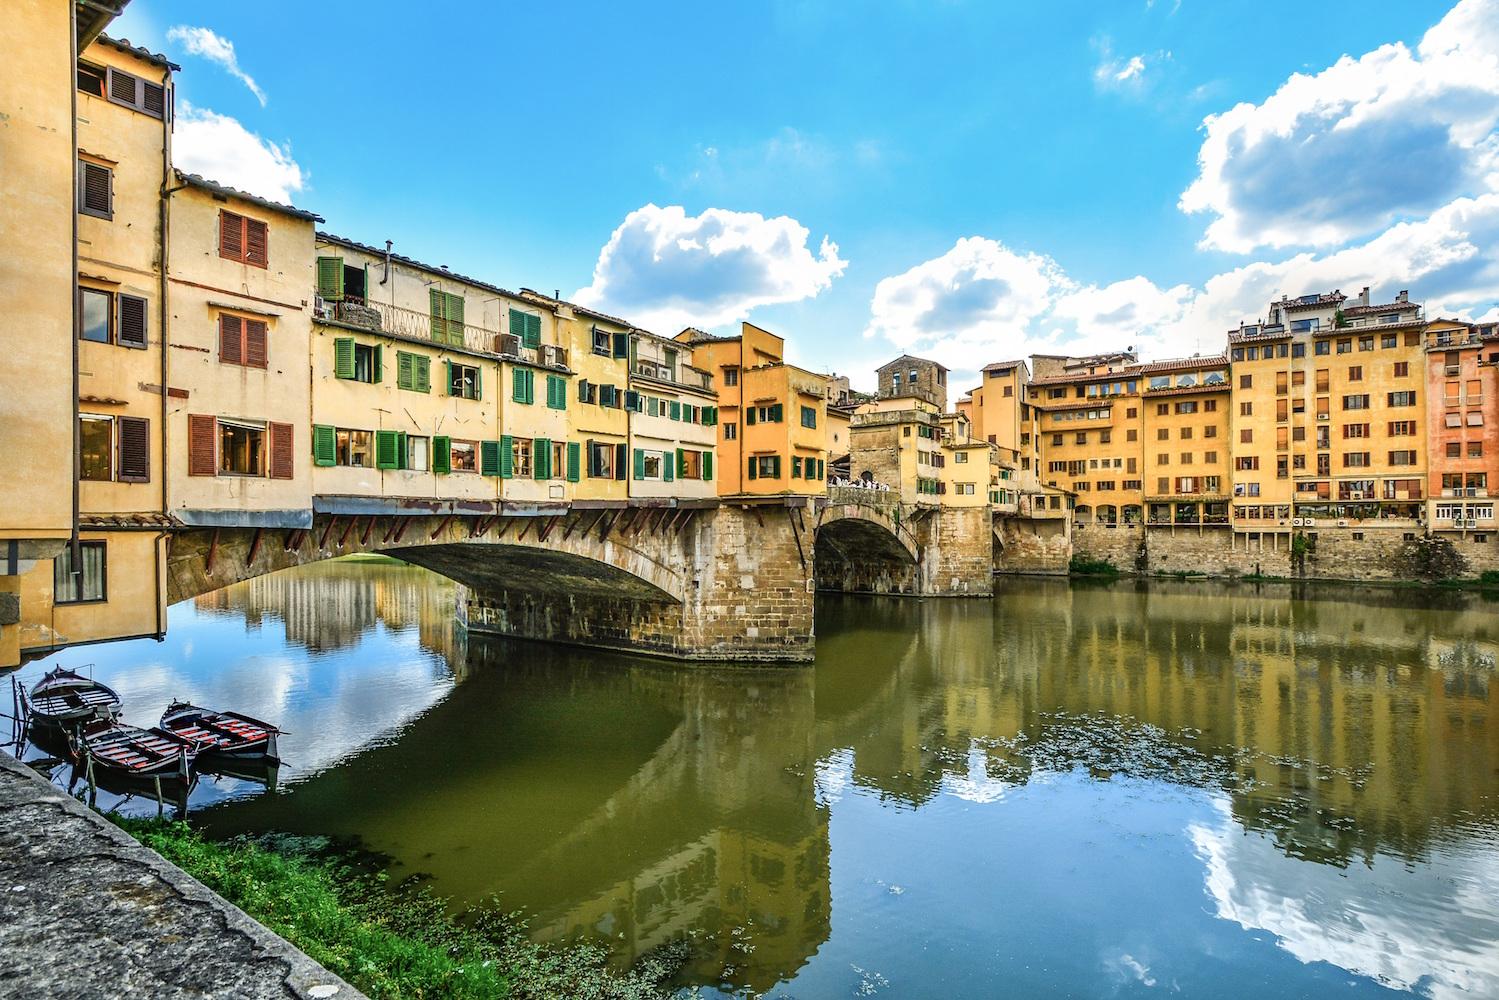 ponte vecchio italie toscane florence